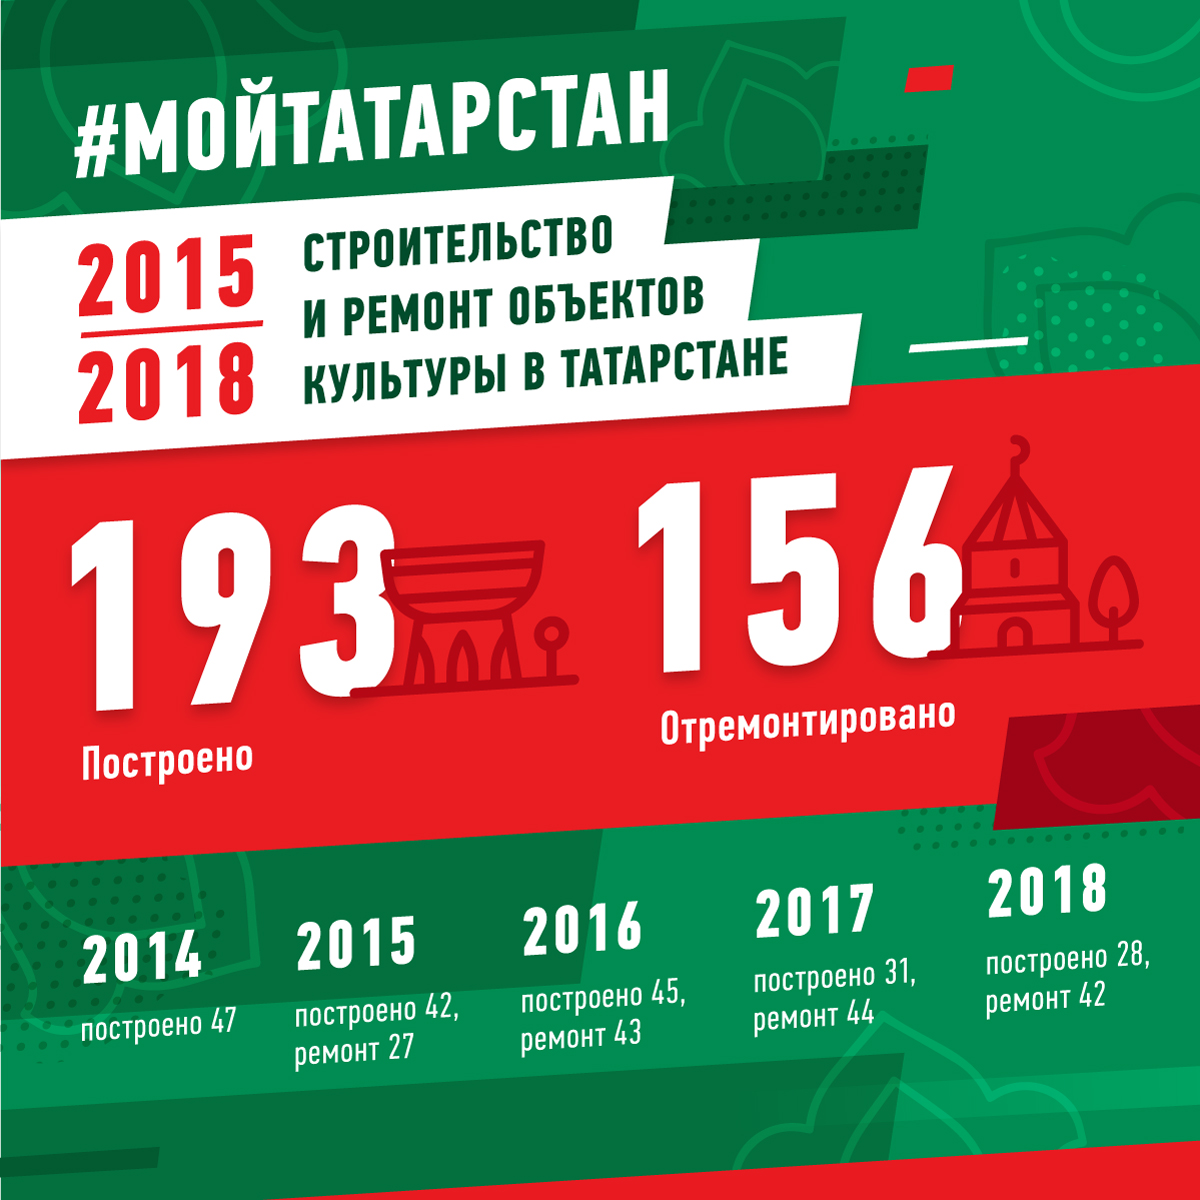 moj-tatarstan-stroitelstvo-obektov